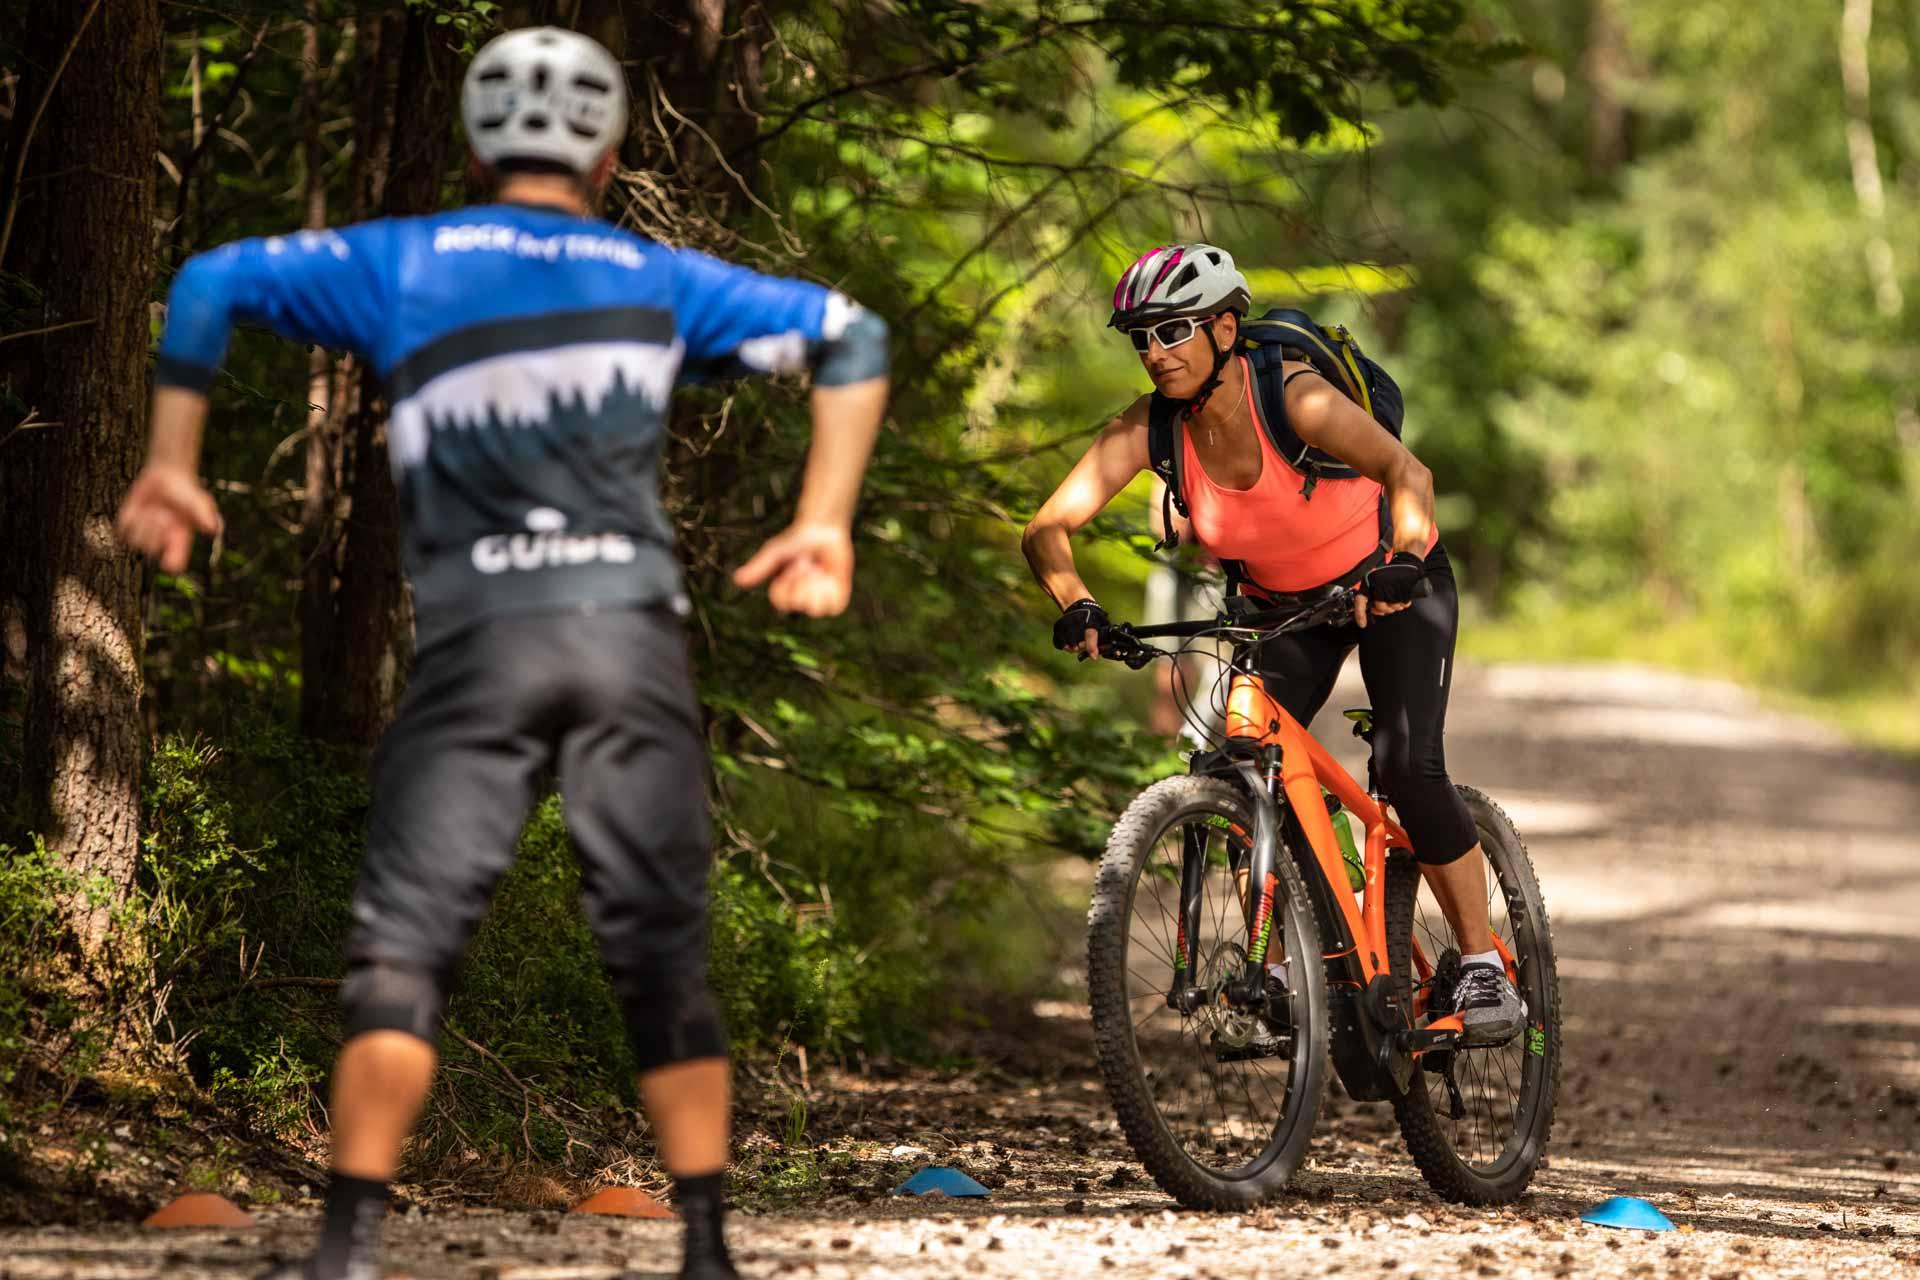 eMTB Basic Fahrtechnik Kurs Bad Orb Spessart Rock my Trail Bikeschule 7